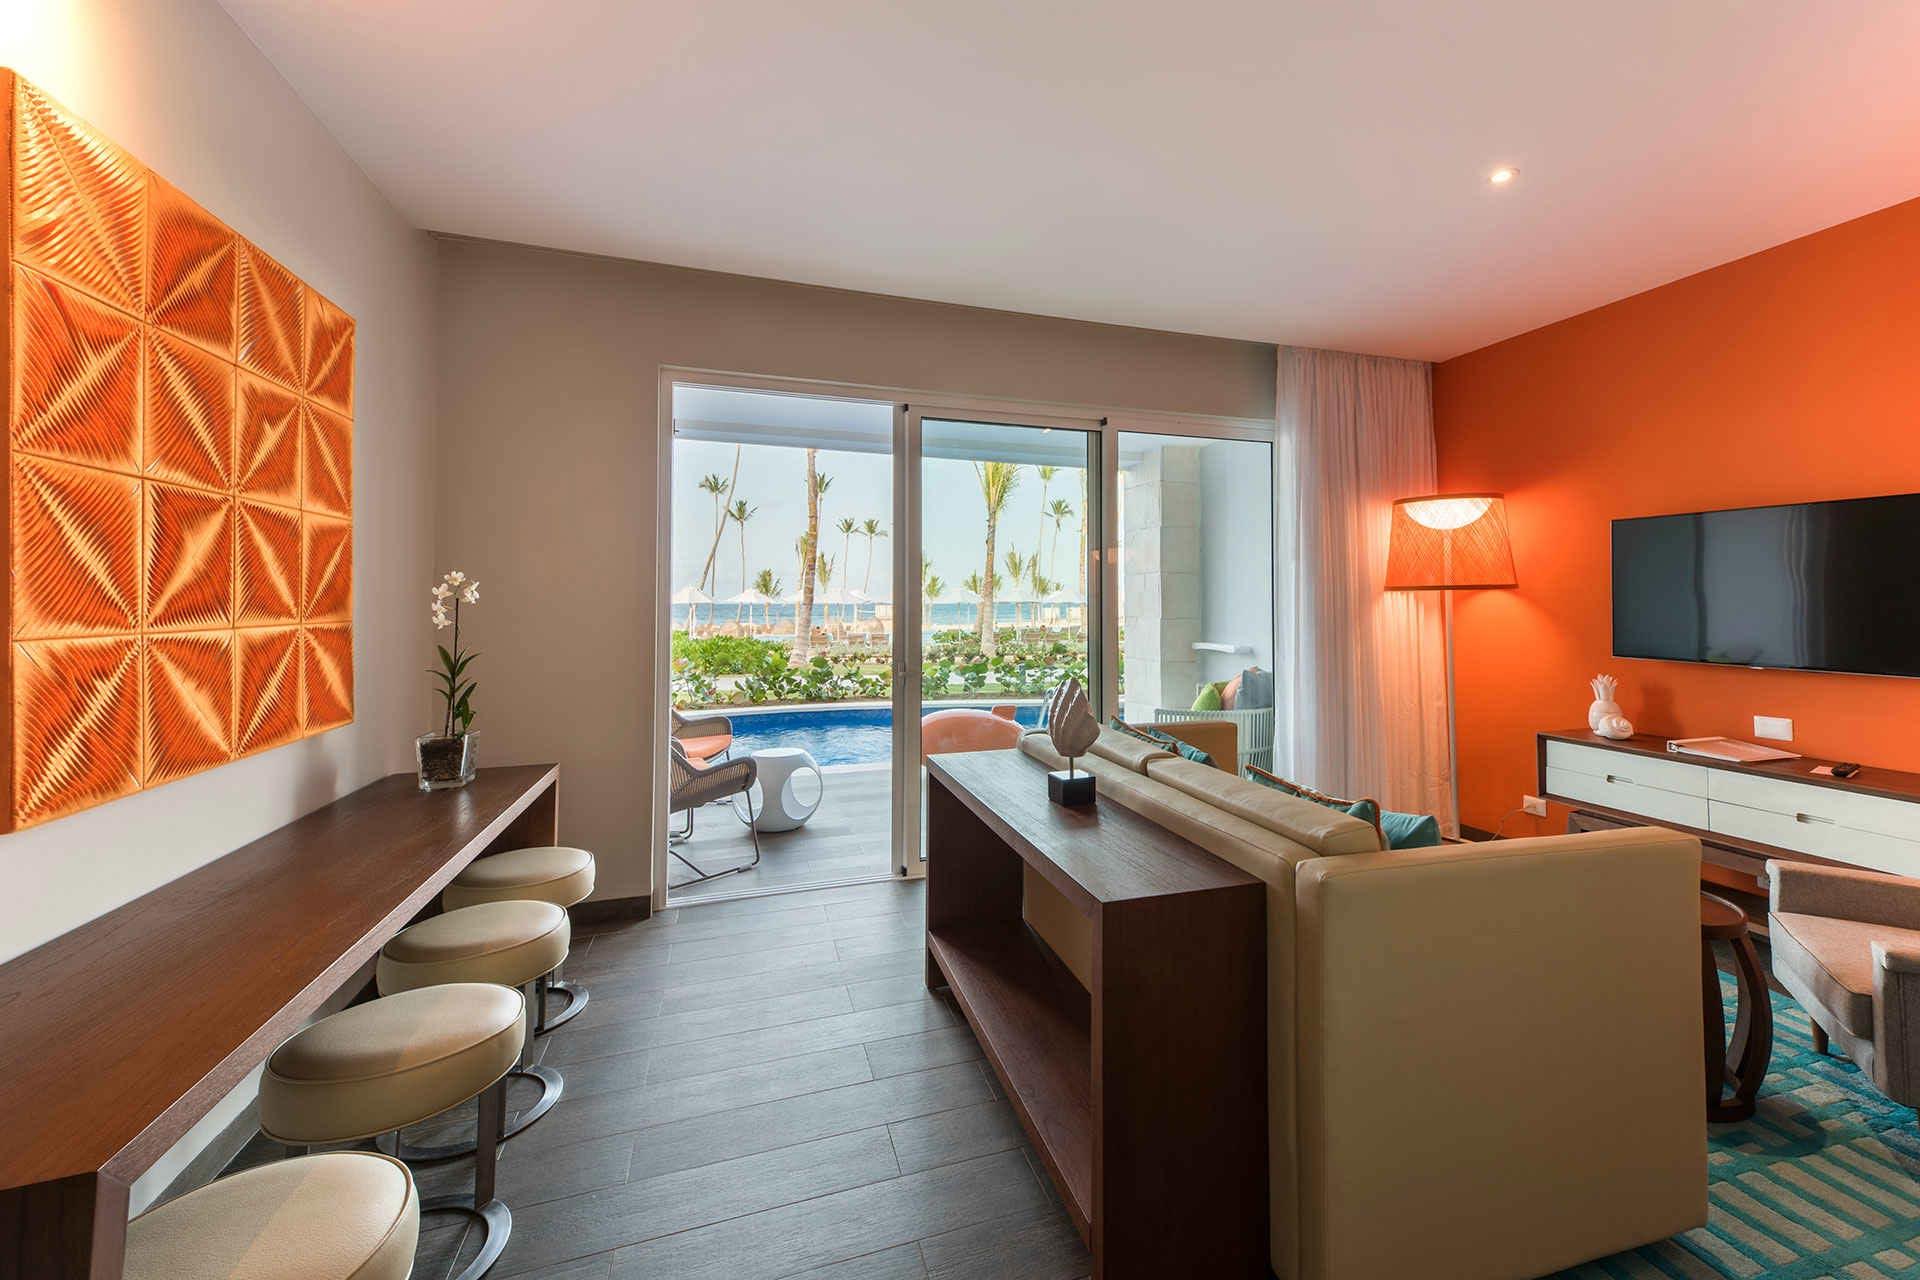 Courtesy of Nickelodeon Hotels & Resorts Punta Cana